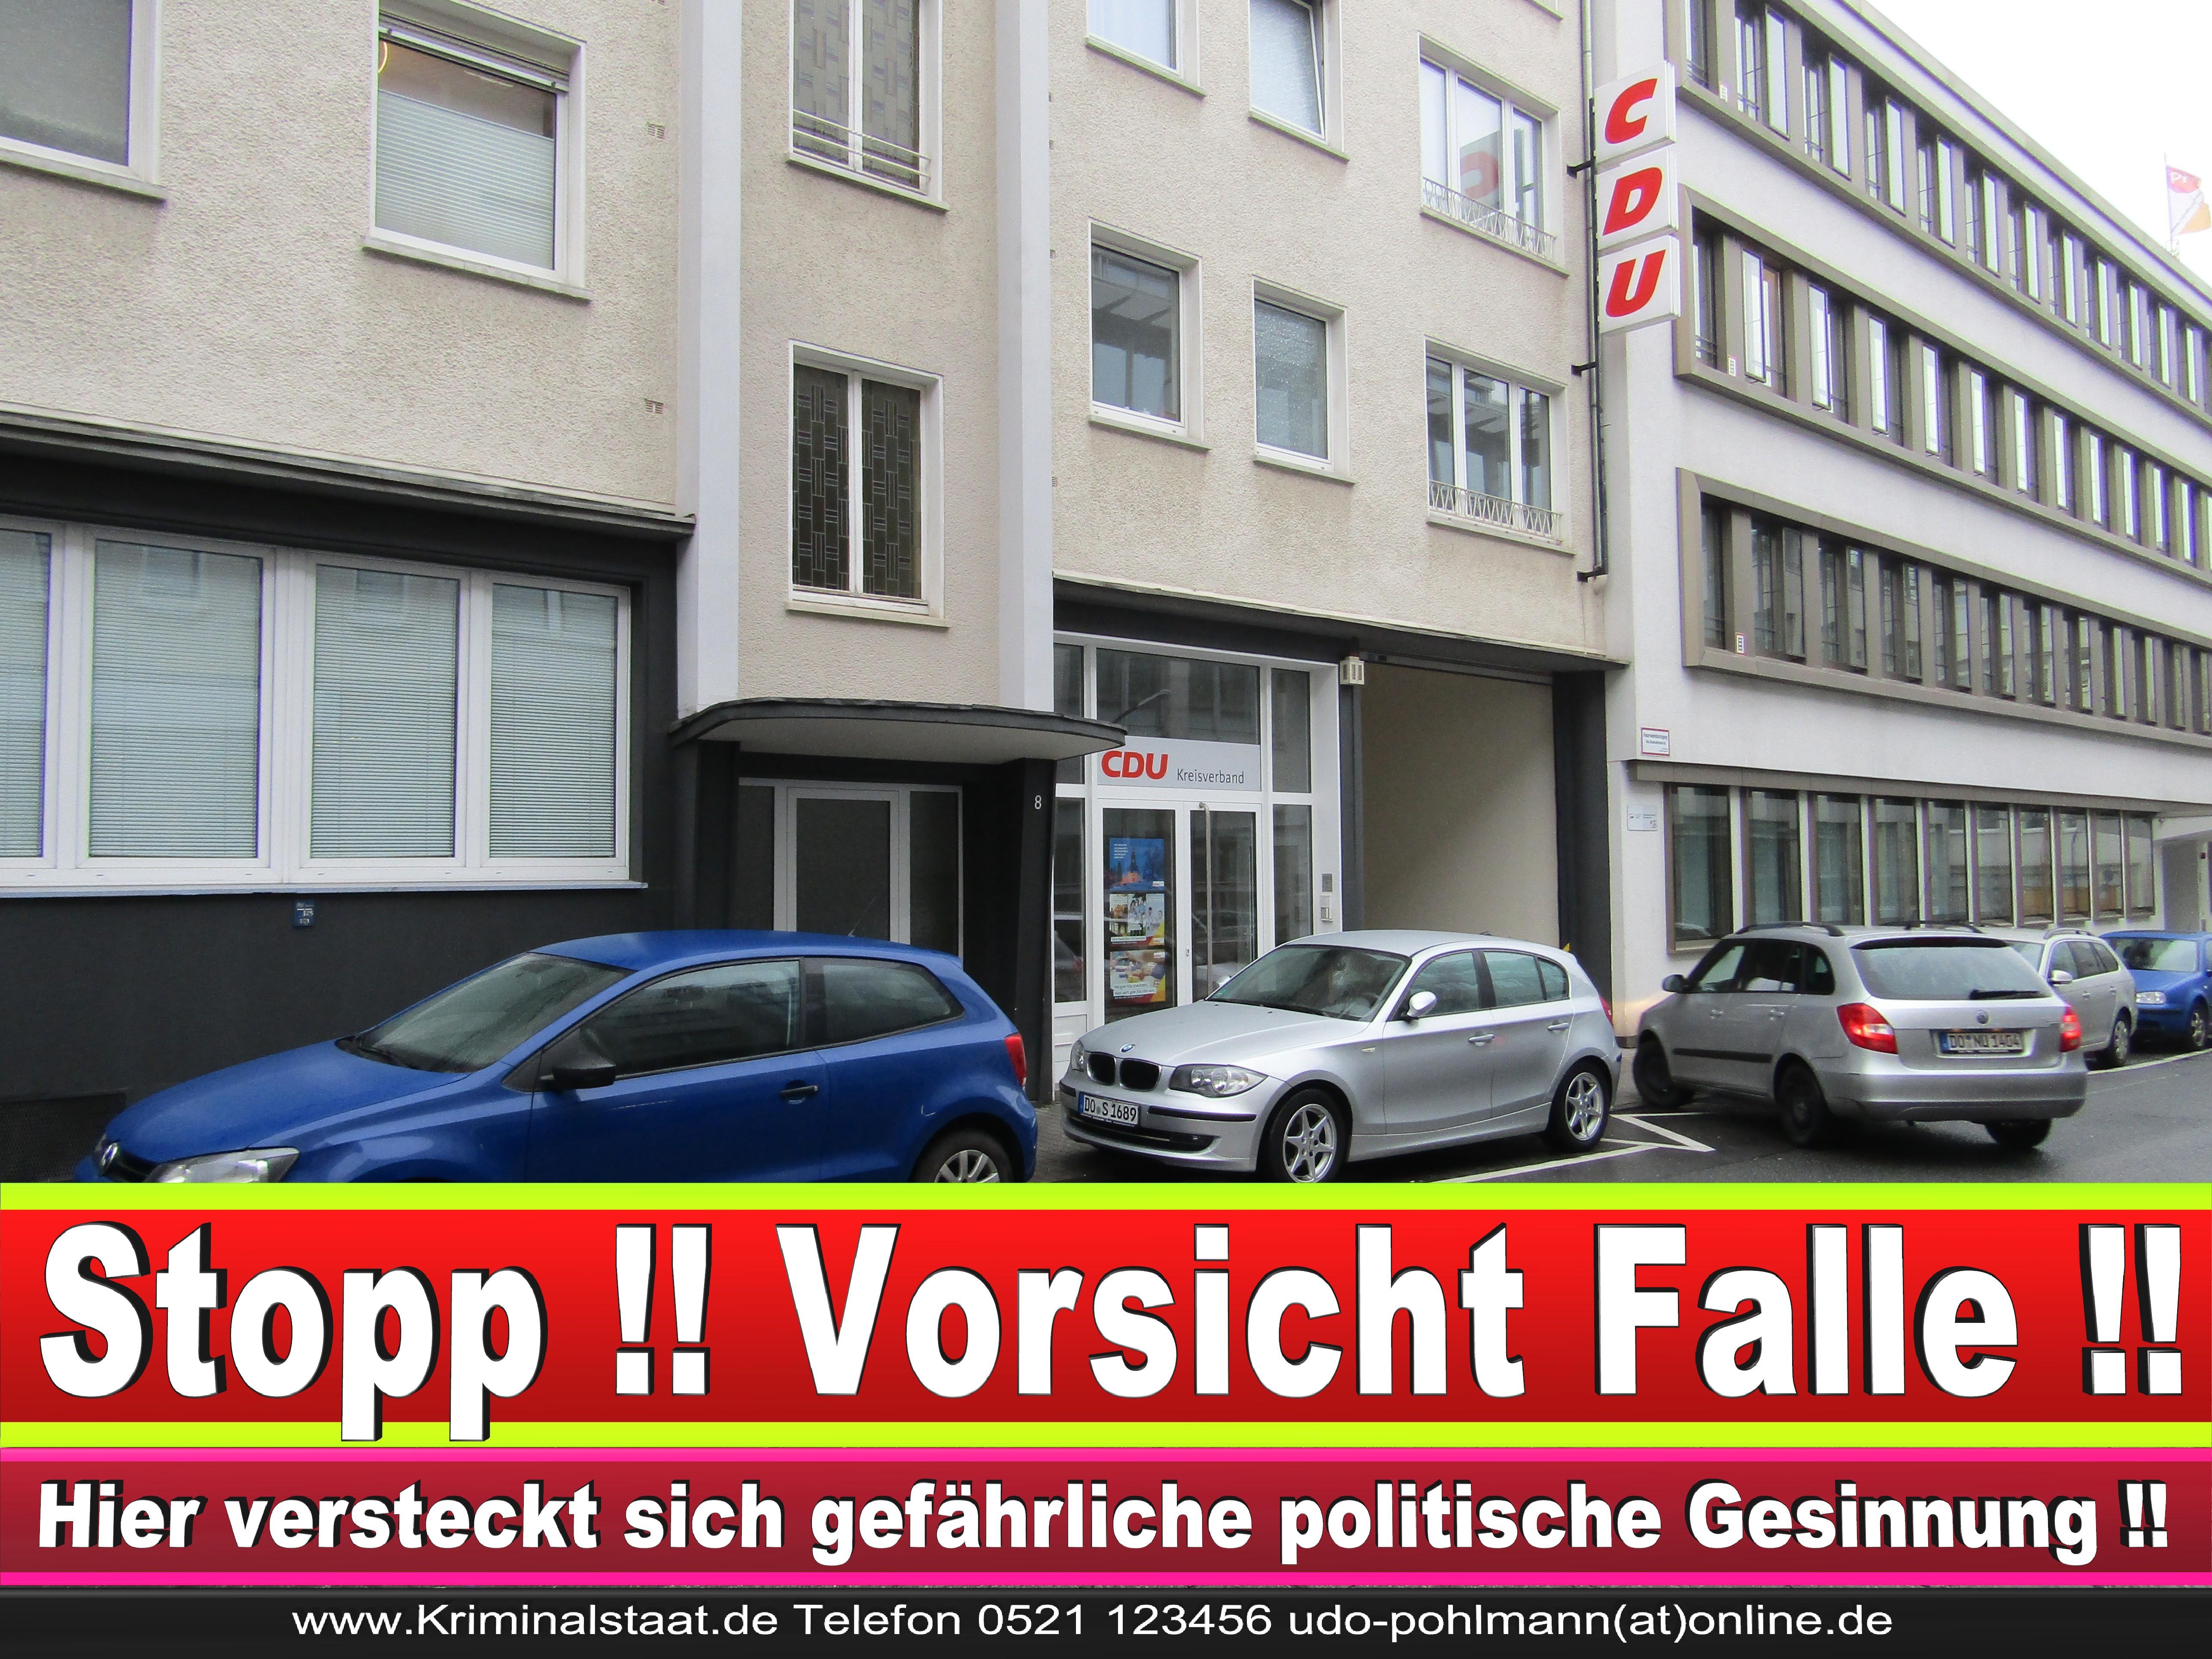 CDU DORTMUND KREISVERBAND BüRGERBüRO CDU FRAKTION ORTSVERBAND CDU NRW GESCHäFTSSTELLE ADRESSE RATSMITGLIEDER CDU (17) 1